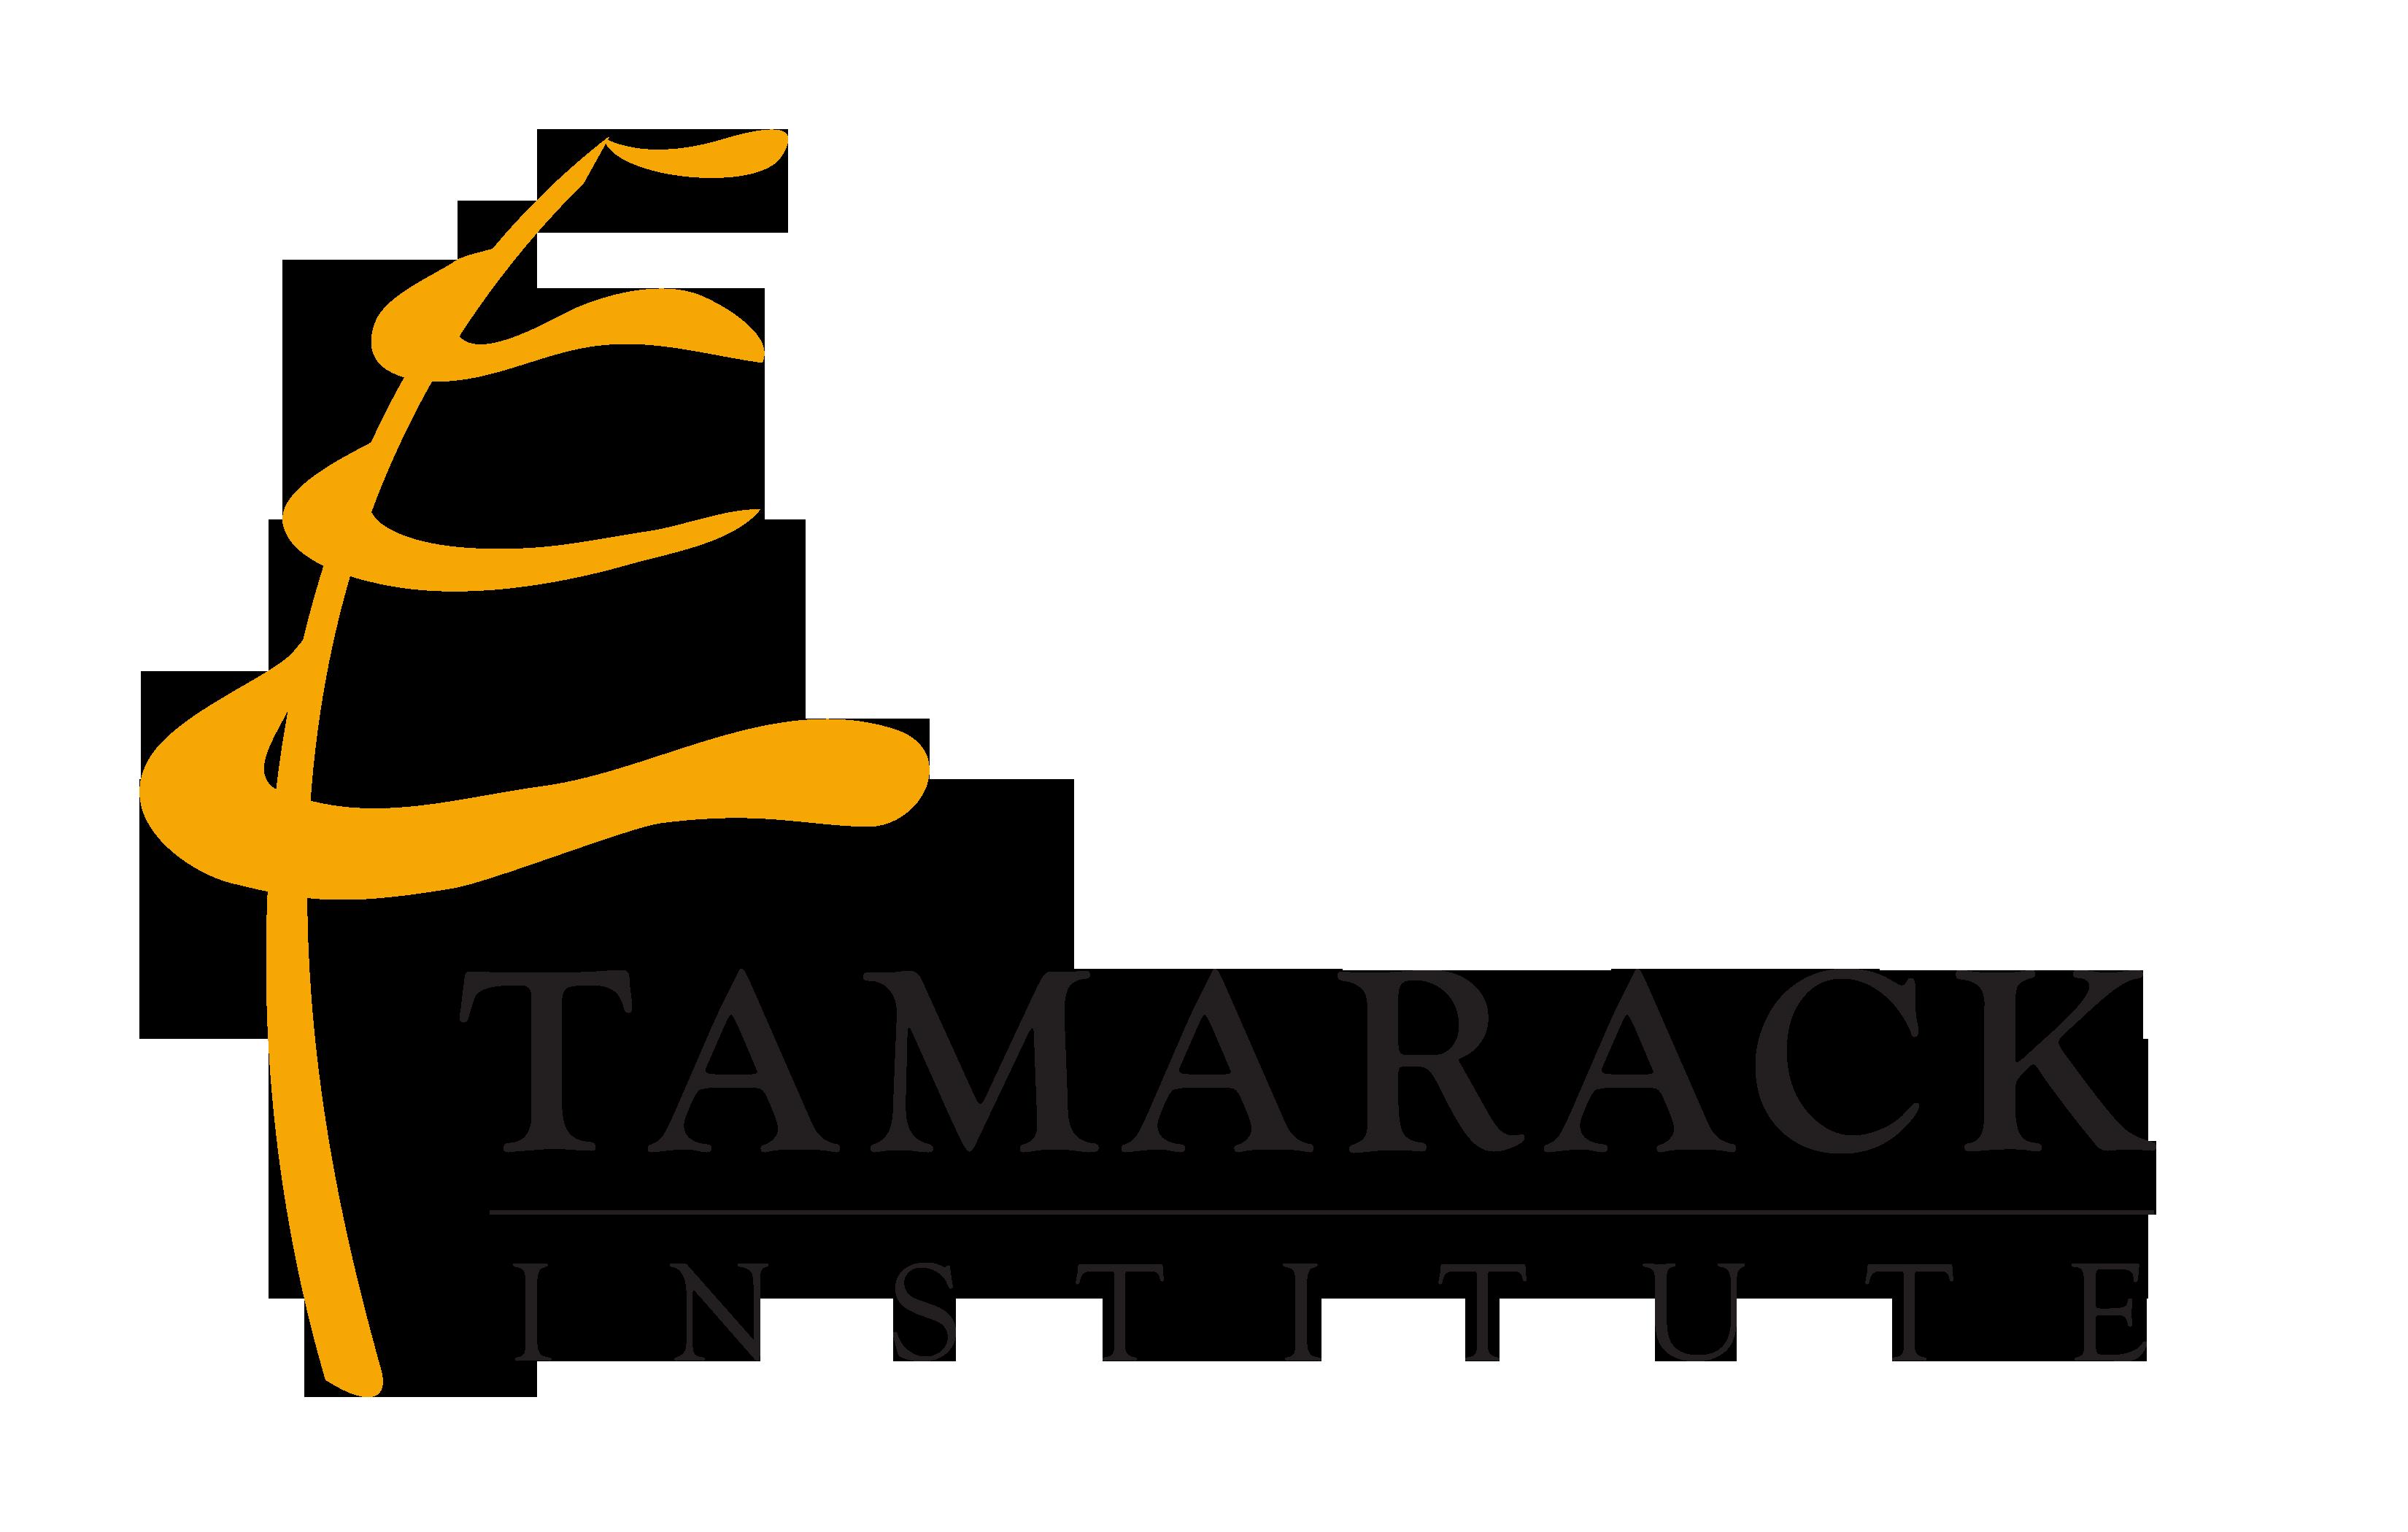 Tamarack_Logo_Transparent03.png